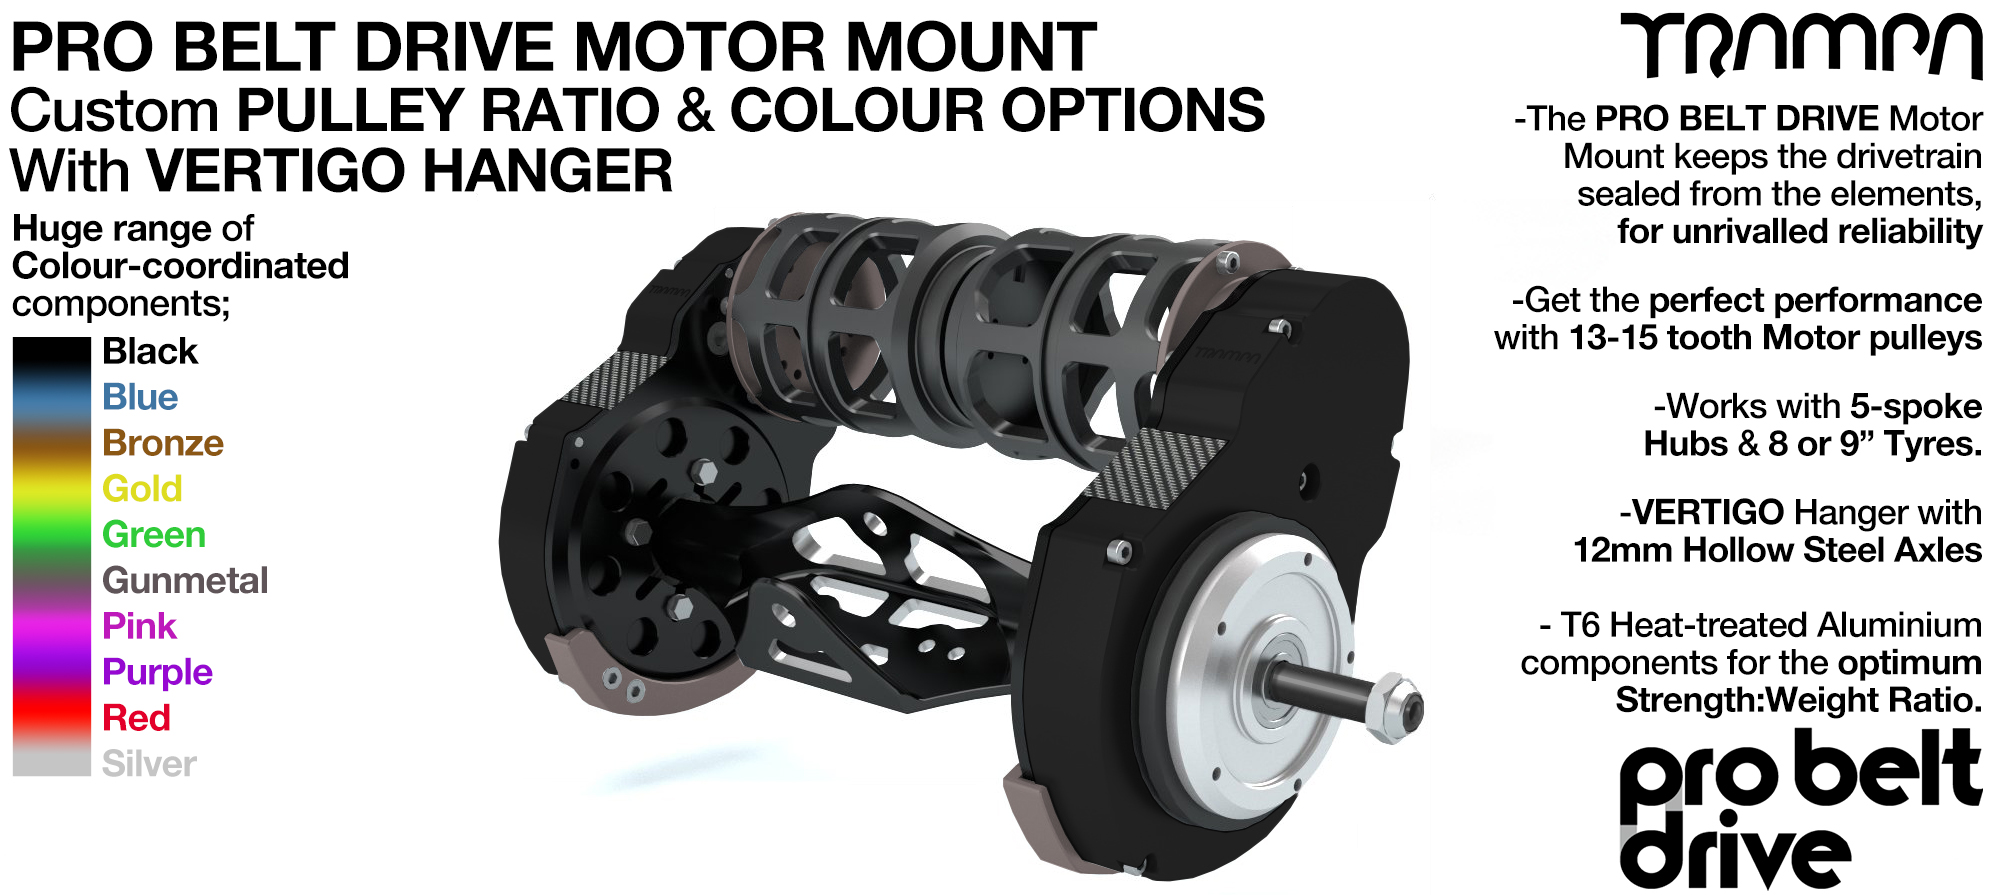 Mountainboard PRO Belt Drive TWIN Motor Mounts, Motors & Precision VERTIGO Hanger